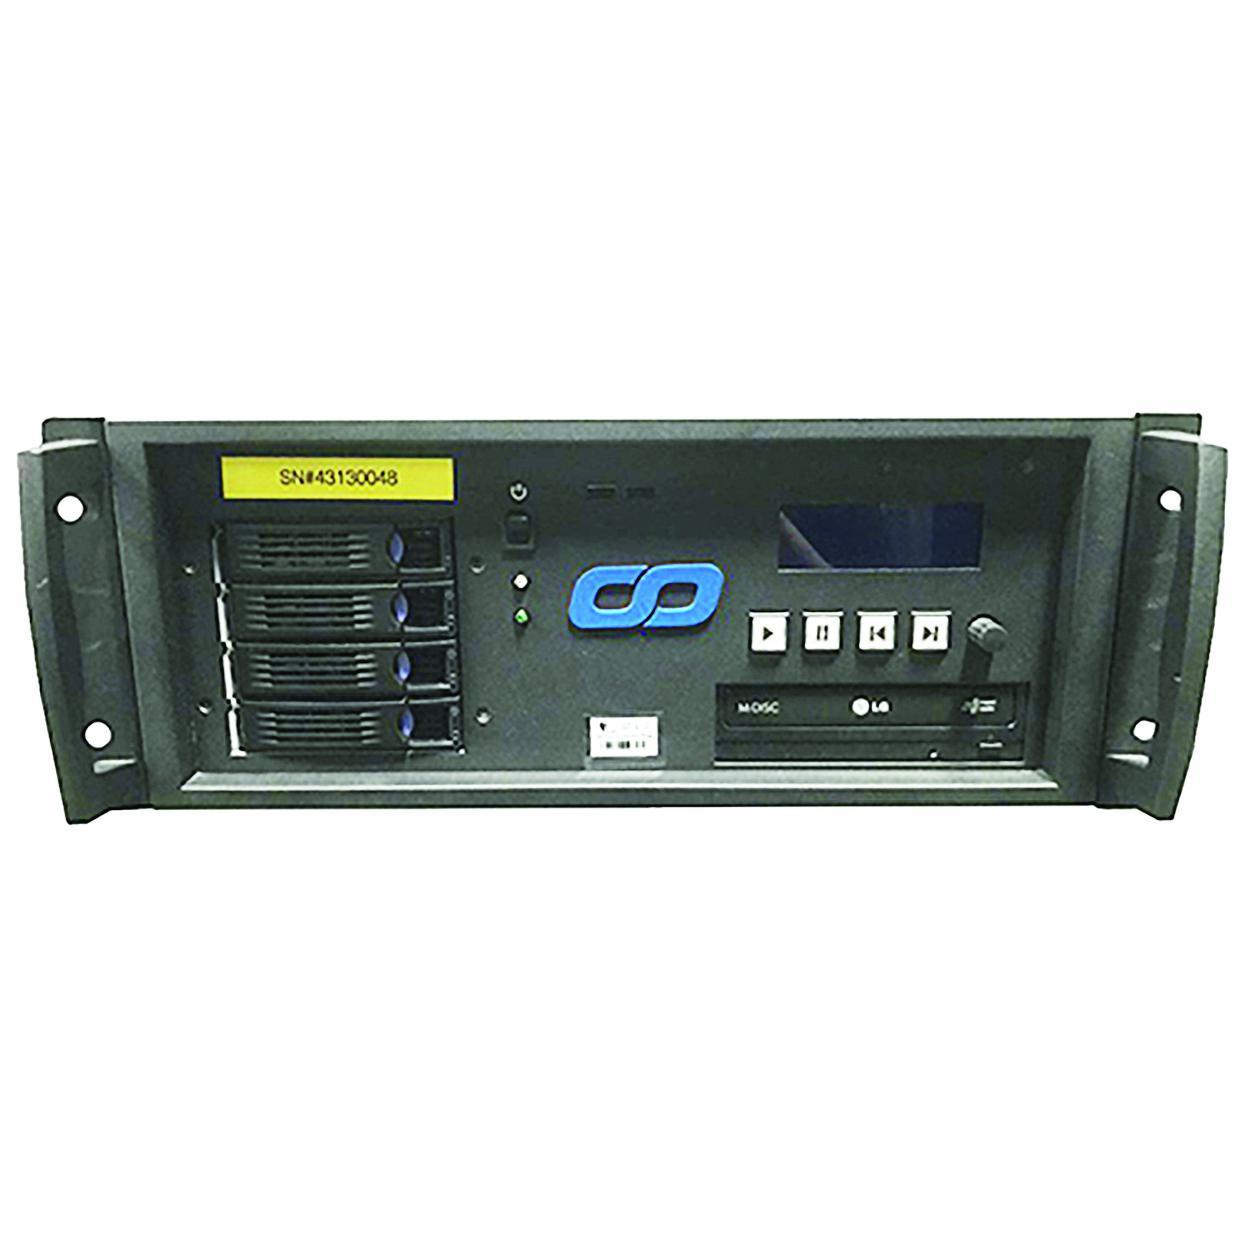 PRG Proshop - Christie Pandoras Box Coolux Media Server STD Quad